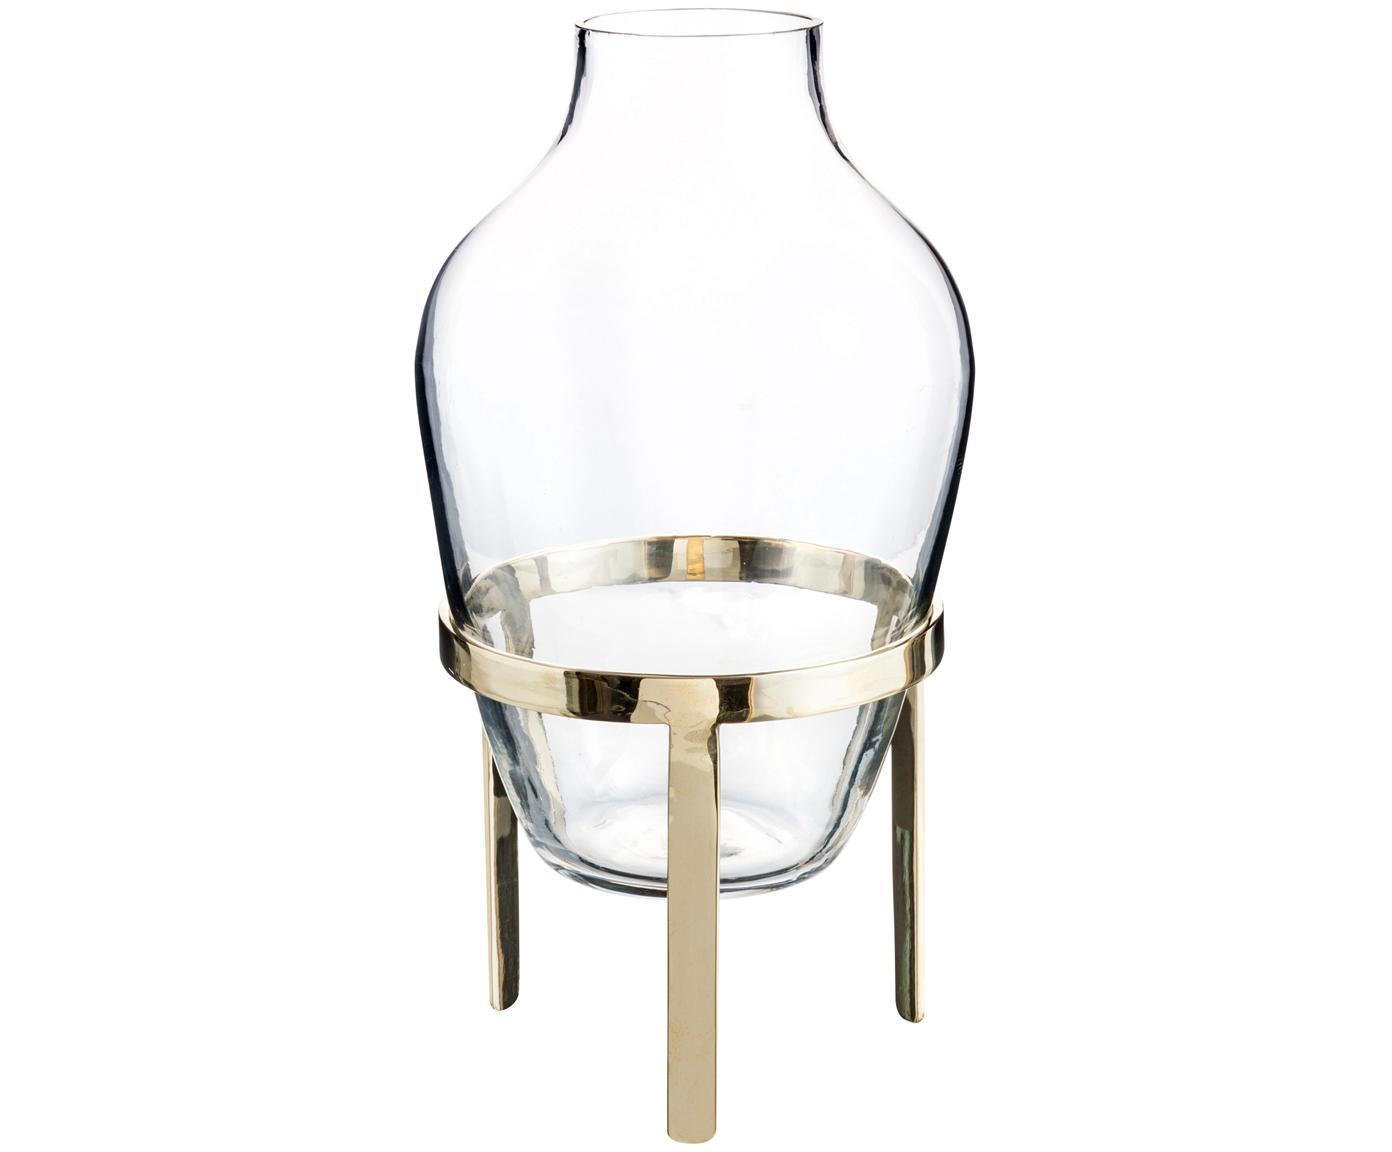 Vase Adorn, Gestell: Messing, Vase: Glas, Gestell: Messing, glänzendVase: Transparent, Ø 14 x H 27 cm